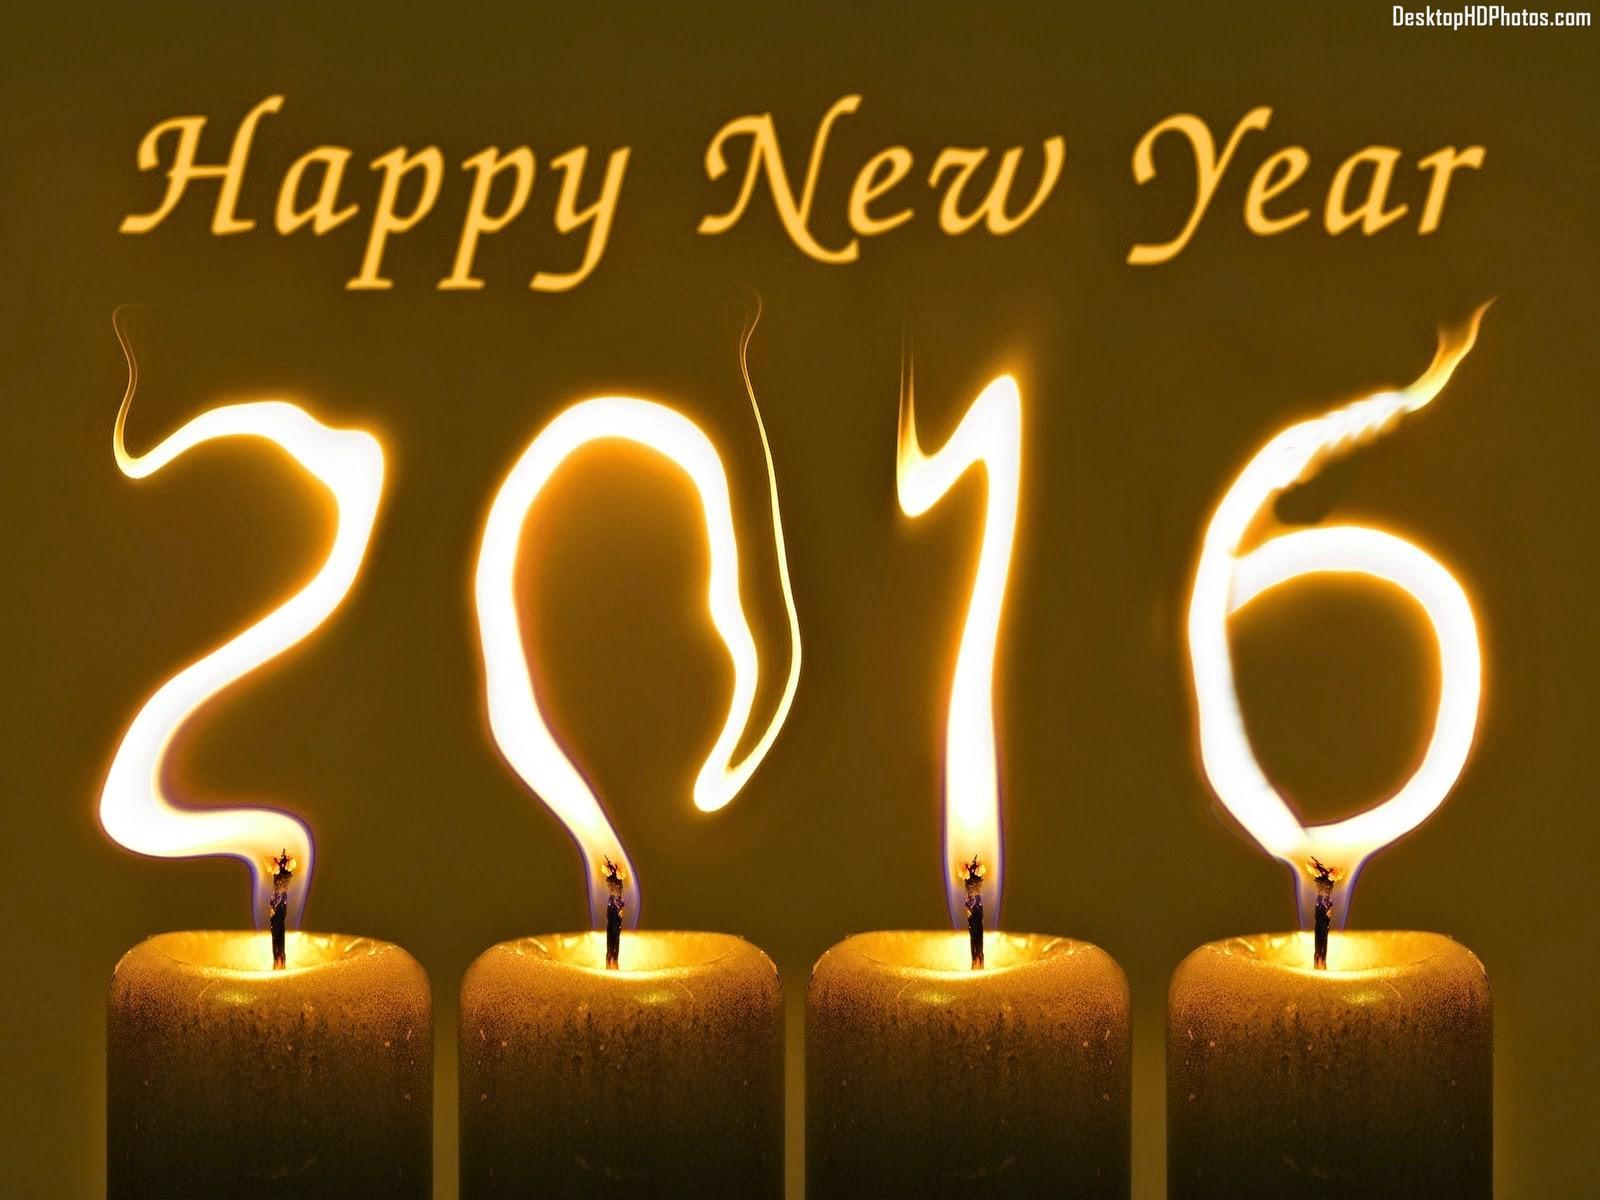 Gambar Dp Bbm Keren Selamat Tahun Baru 2016 Terbaru